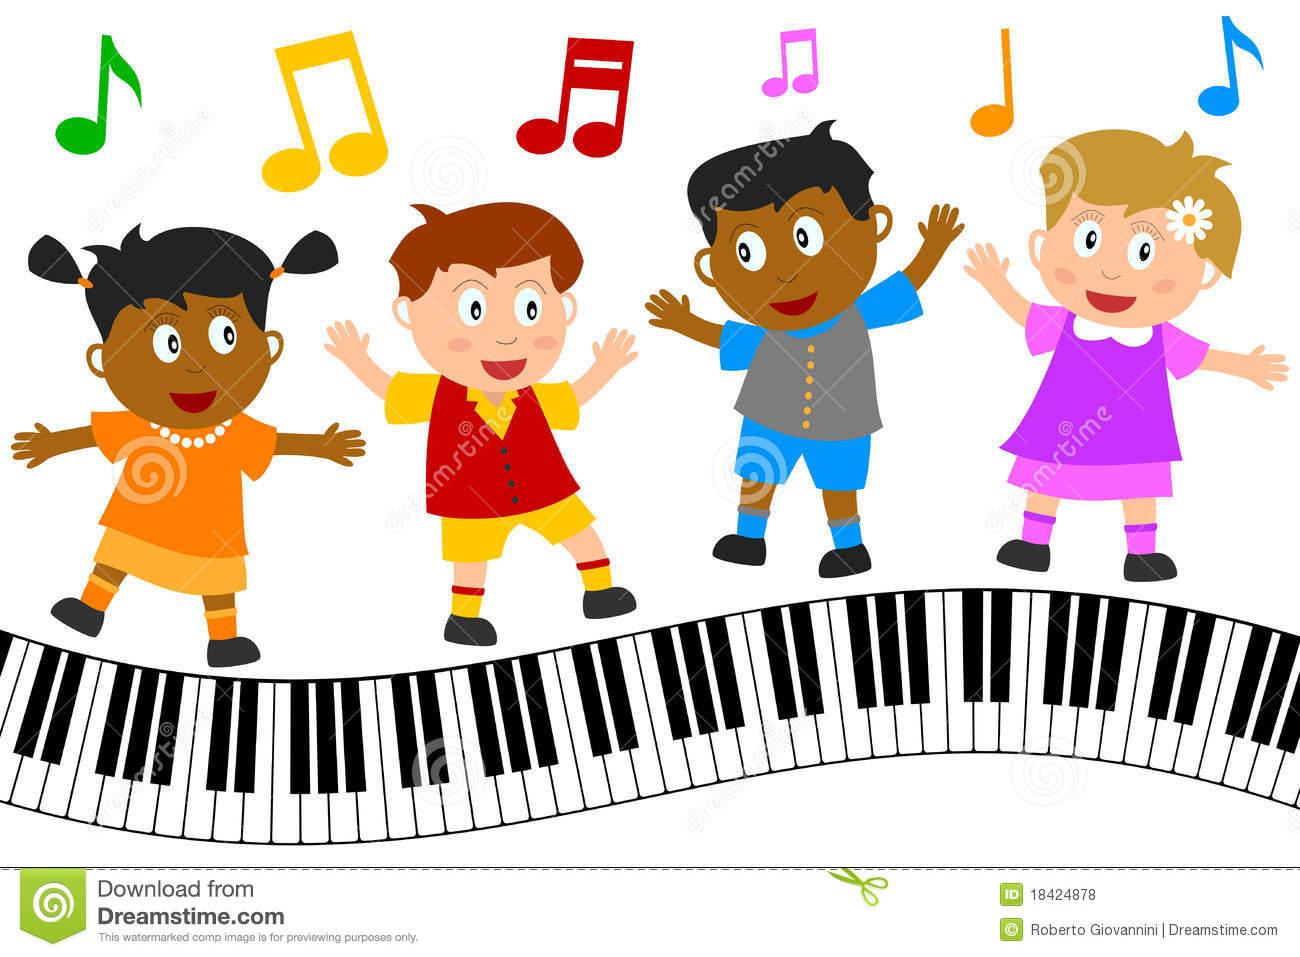 Musician clipart children's. Music clip art for